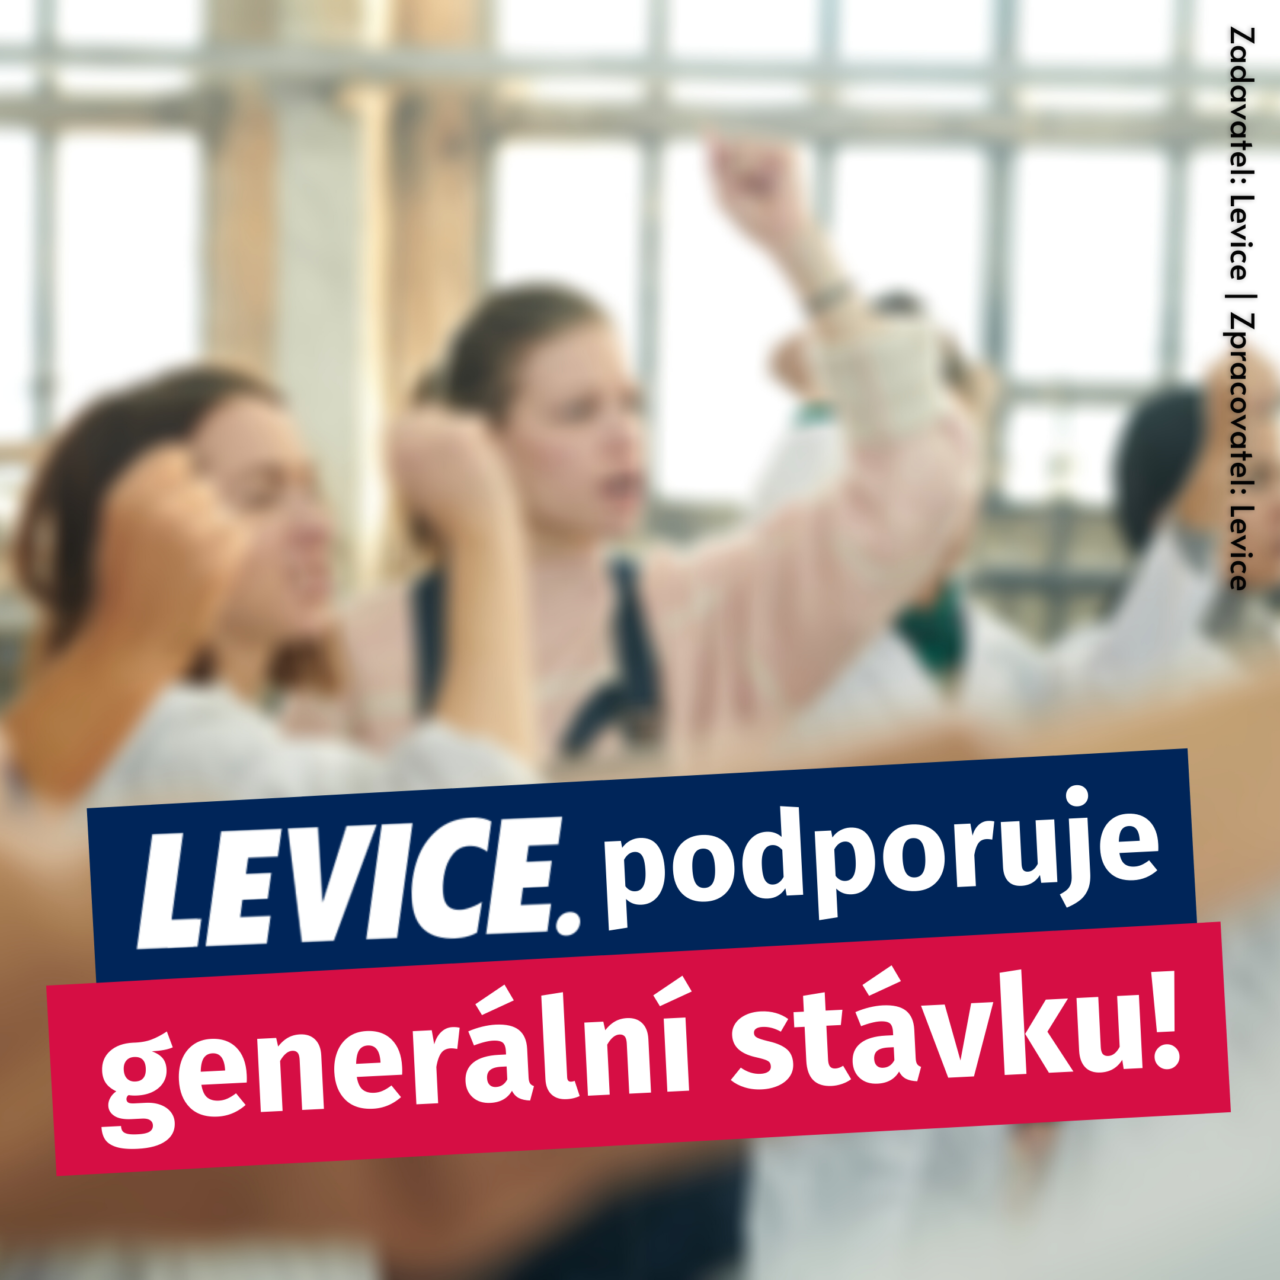 https://jsmelevice.cz/wp-content/uploads/2021/03/Generalni-stavka-1-1280x1280.png